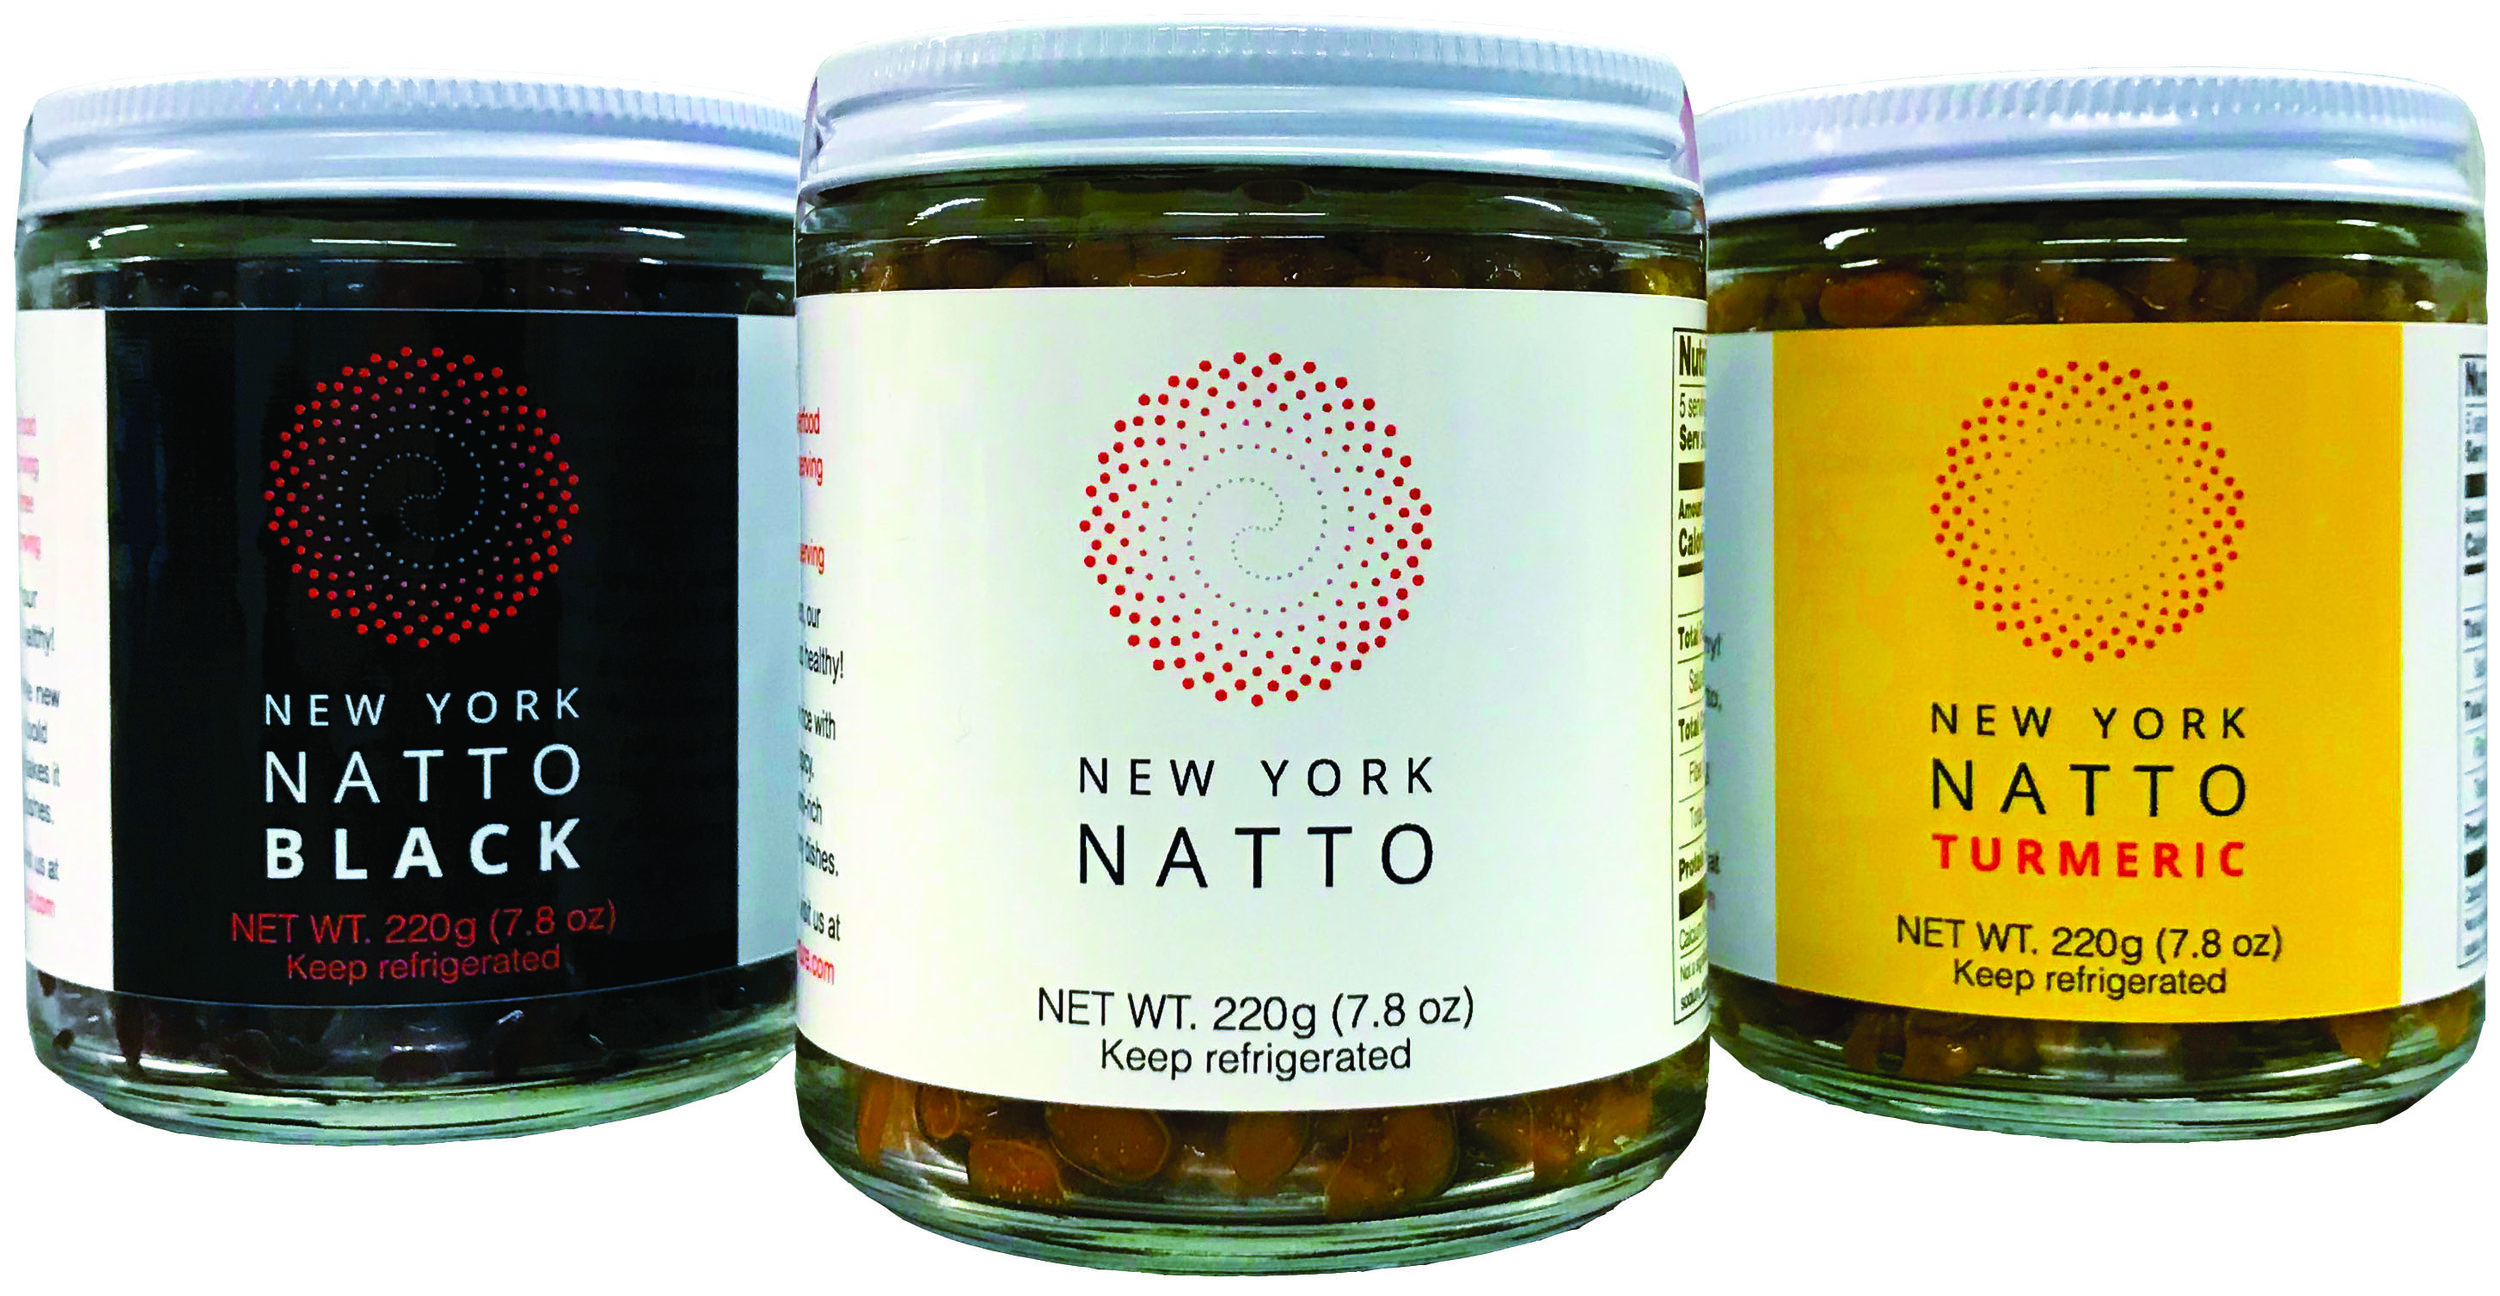 New York Natto.Original-Black-Turmeric.jpg